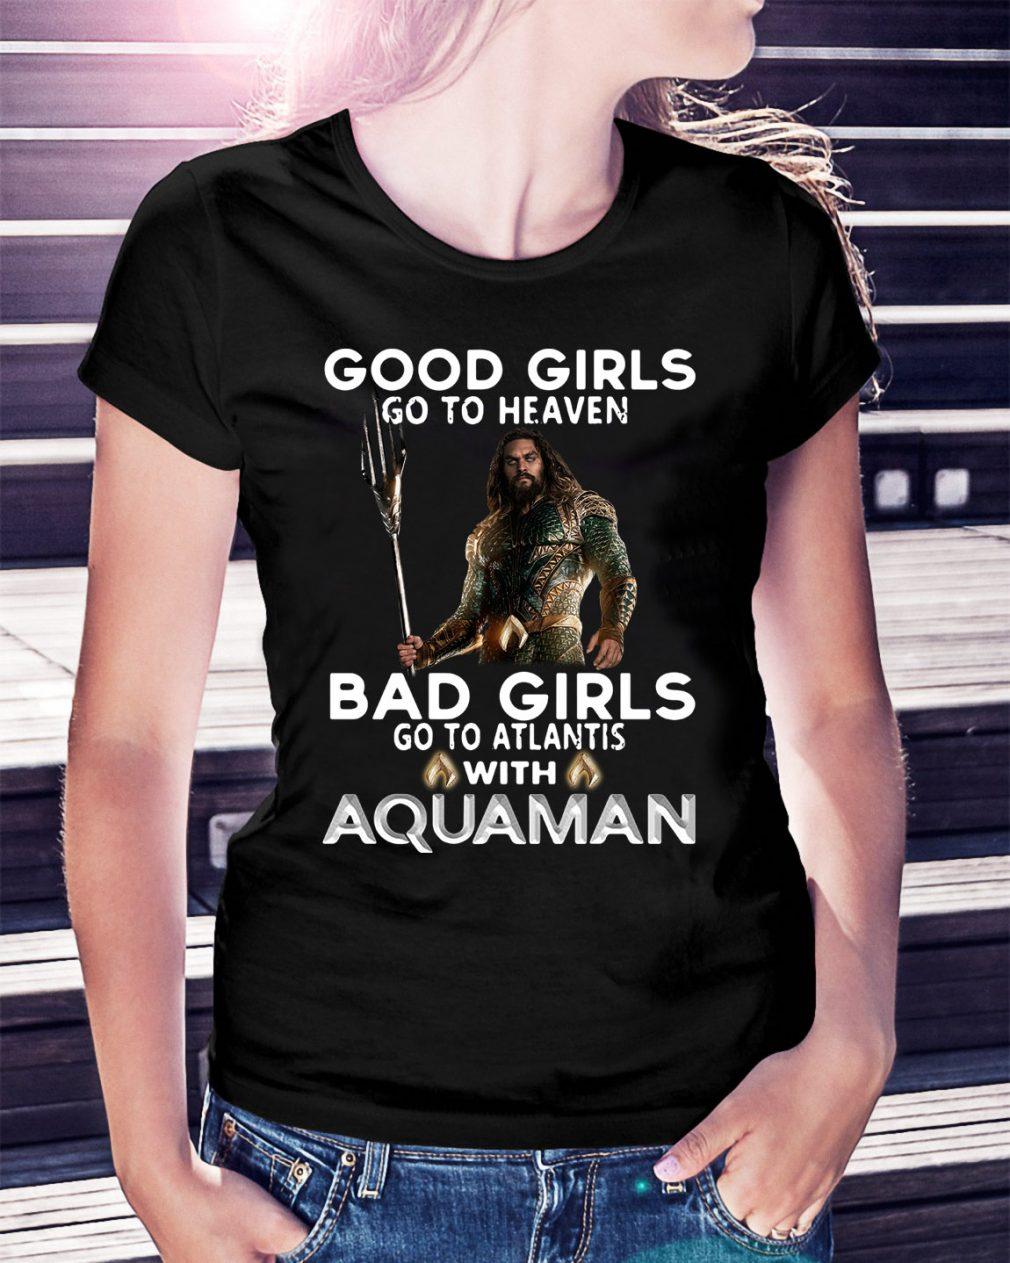 Good girls go to heaven bad girls go to Atlantis with Aquaman Ladies Tee